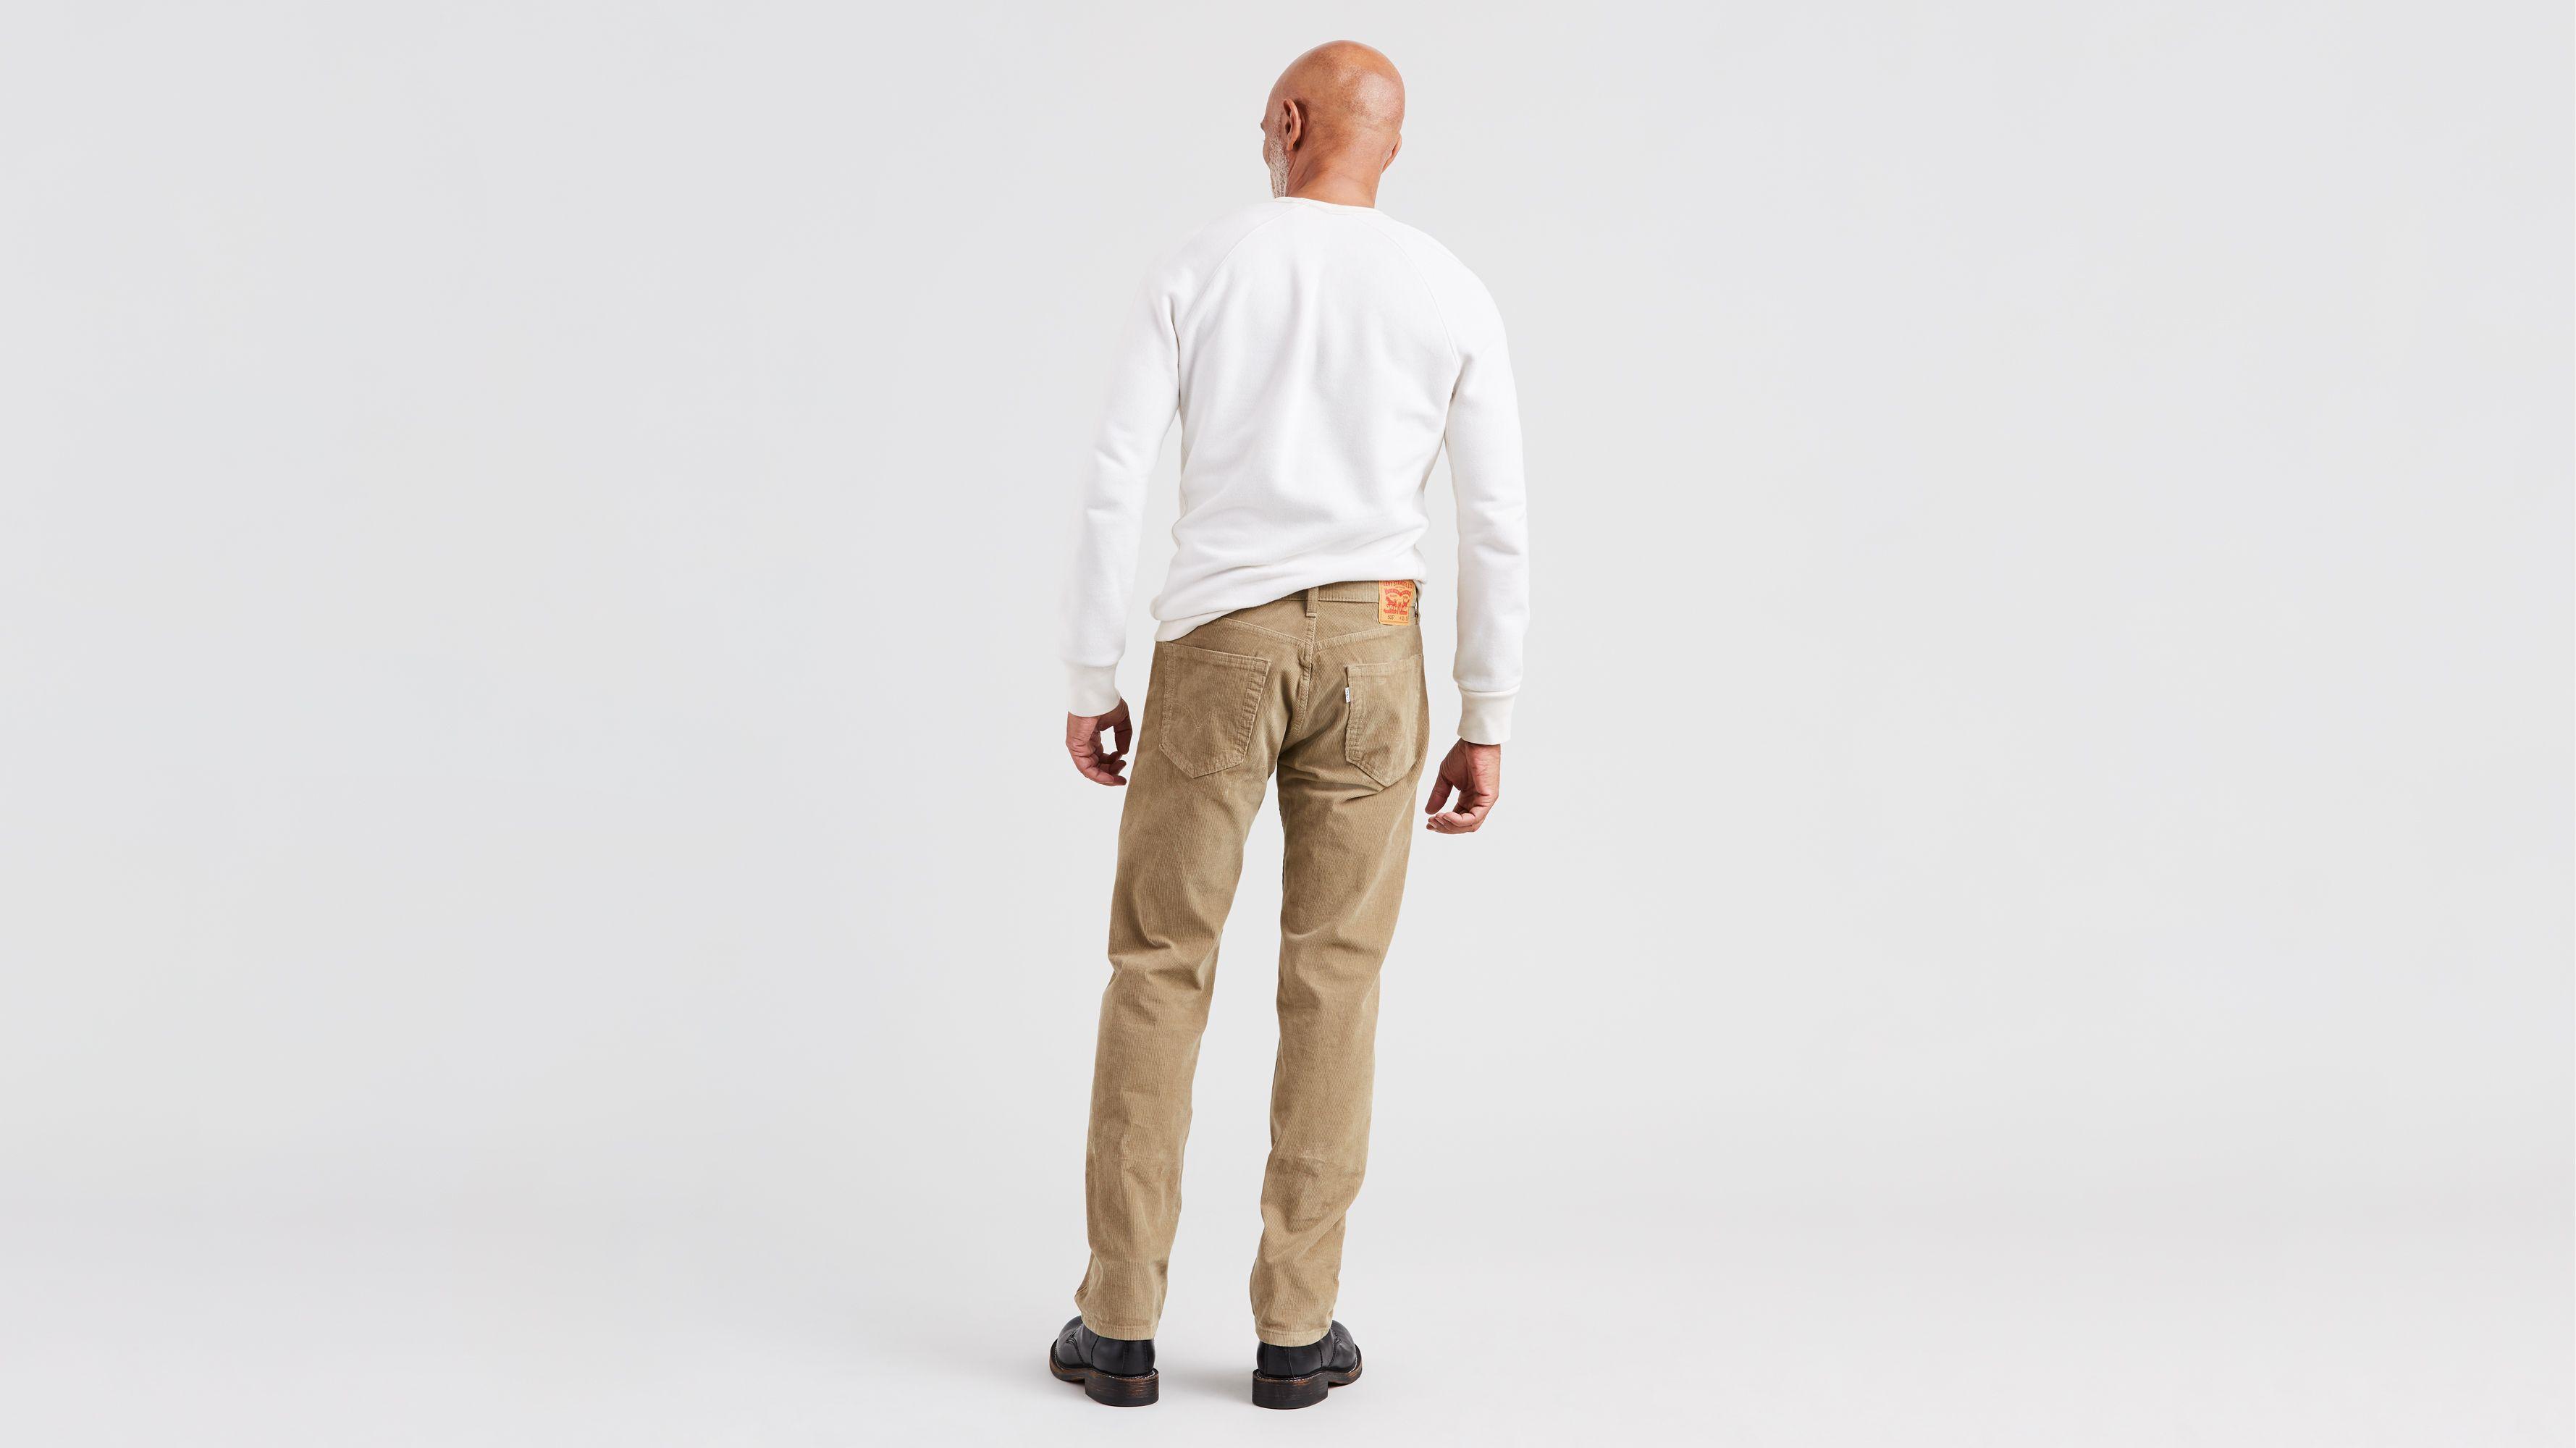 NEXT boys trouser corduroy navy 3 4 5 6 7 8 9 10 11 12 13 14 15 16 years